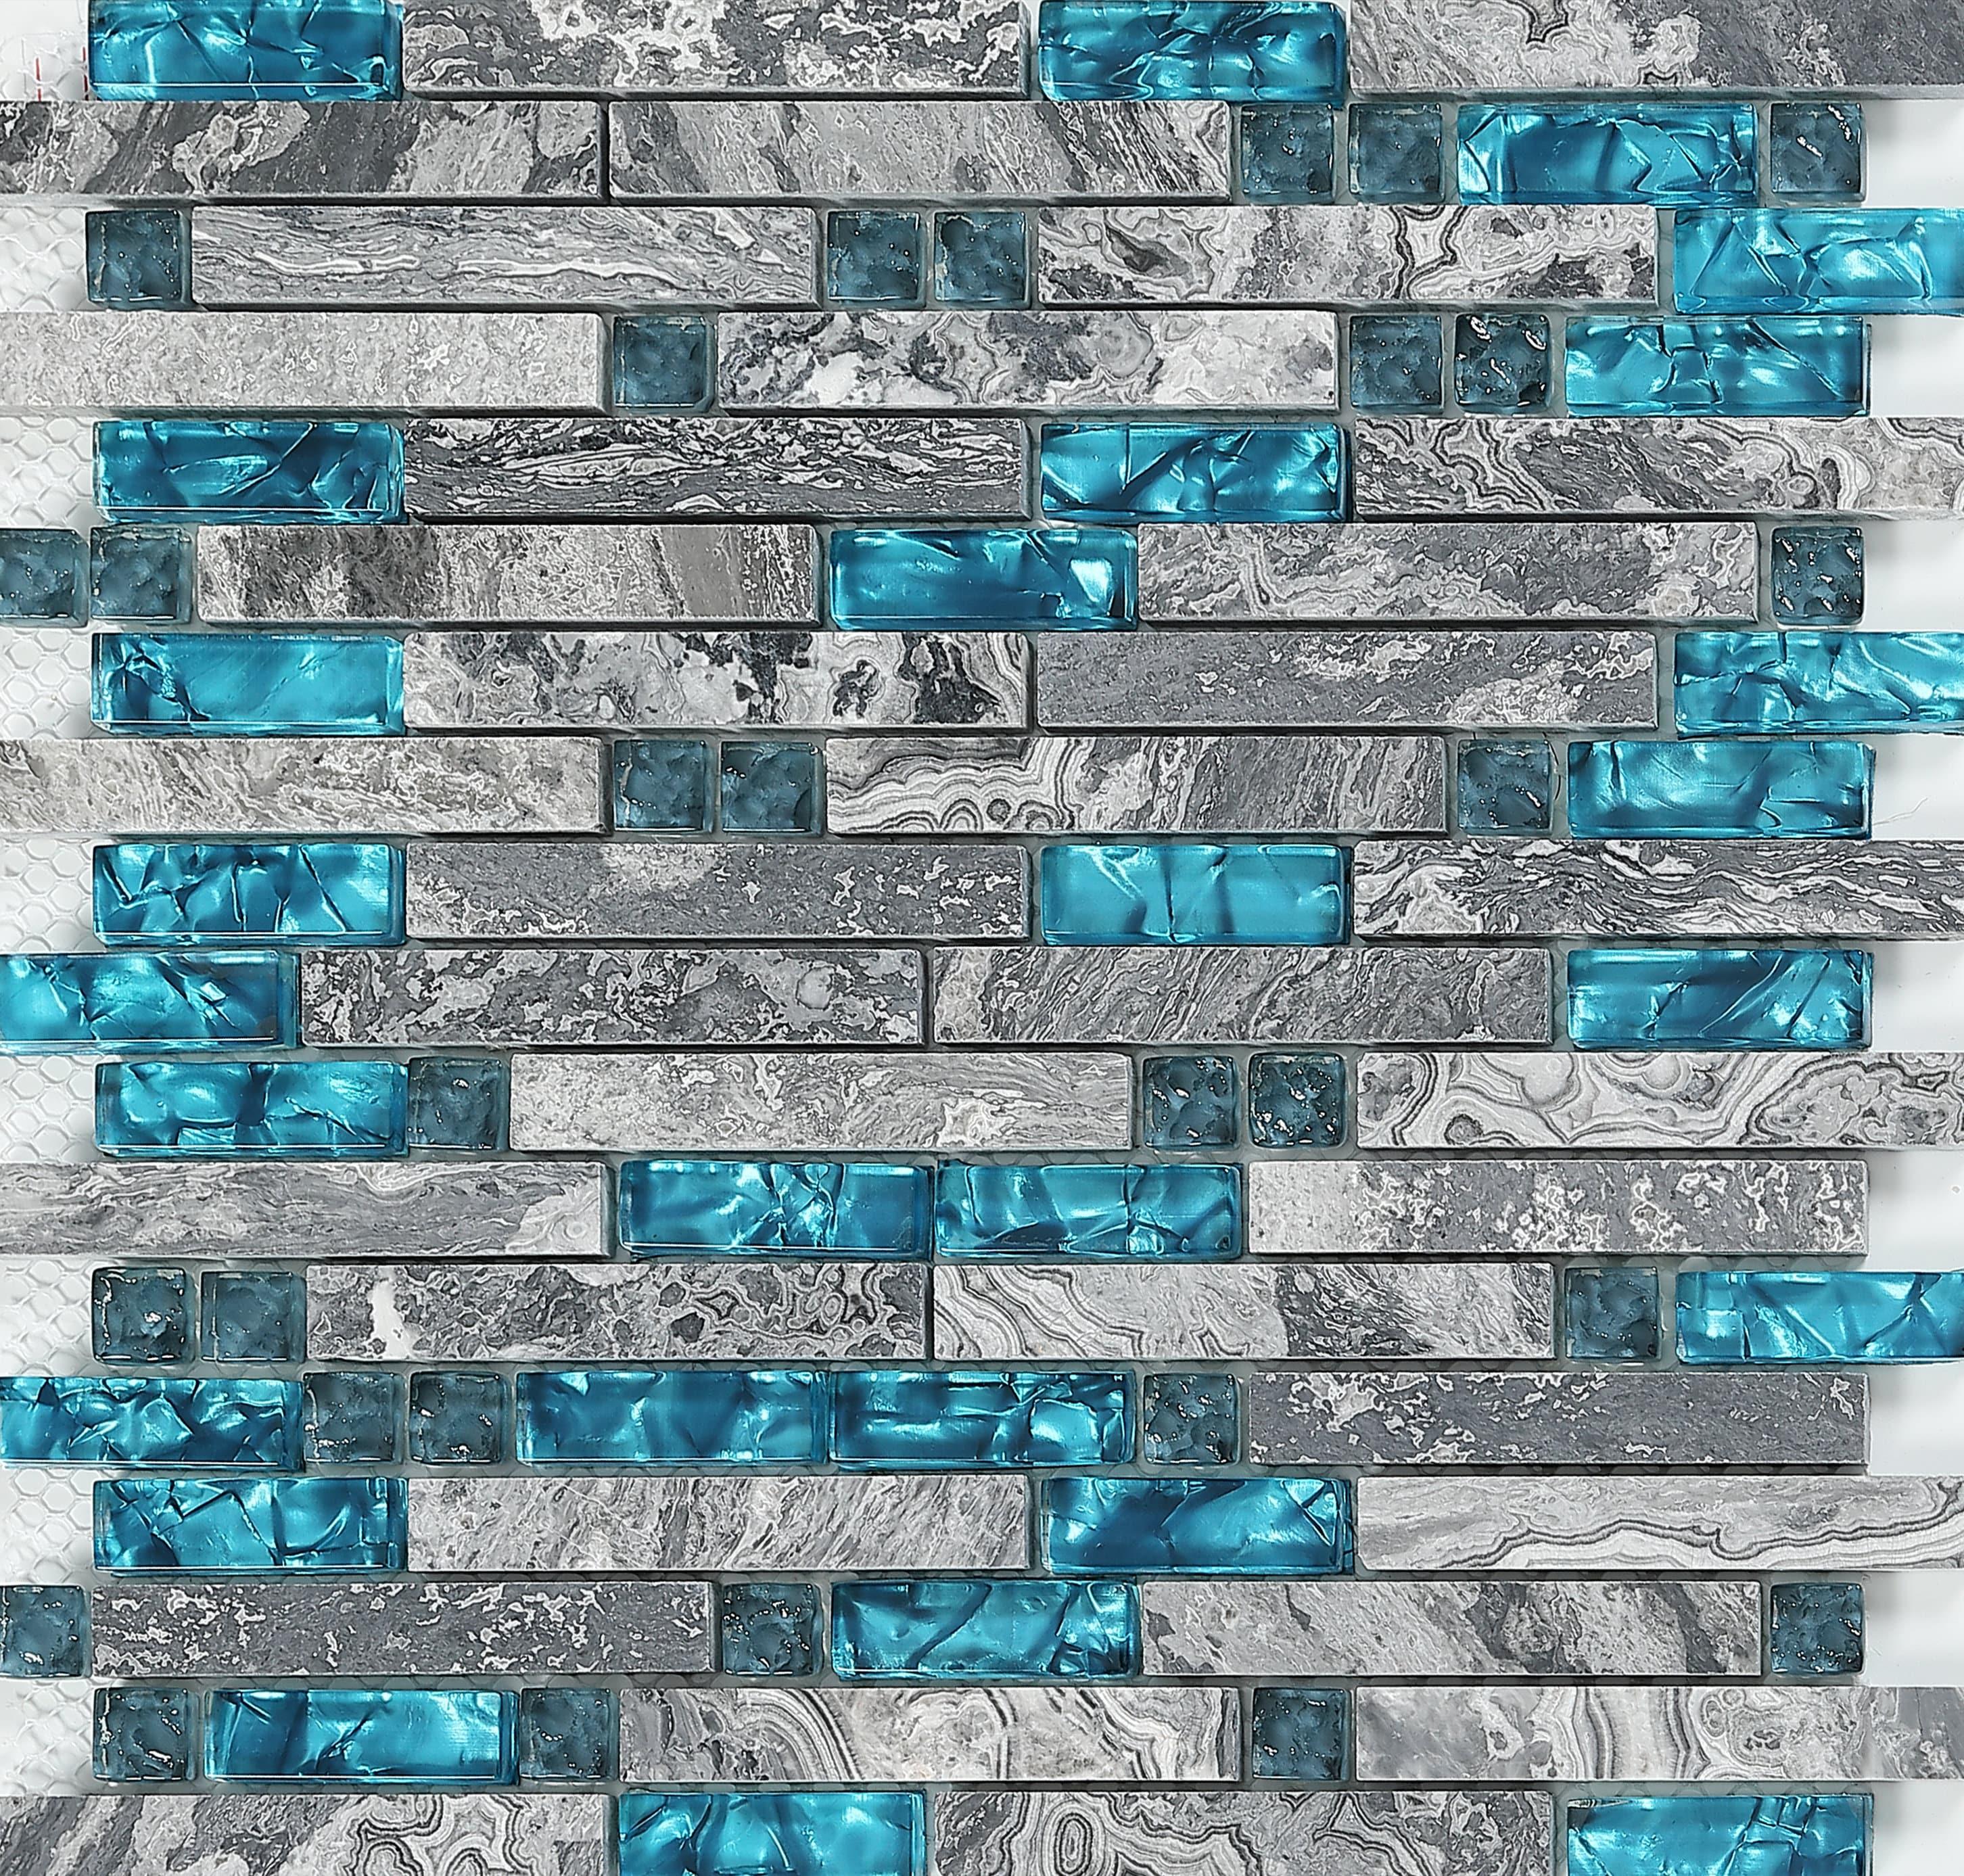 Random Kitchen Tile Patterns: Gray Marble Backsplash Wall Tiles Teal Blue Glass Bathroom